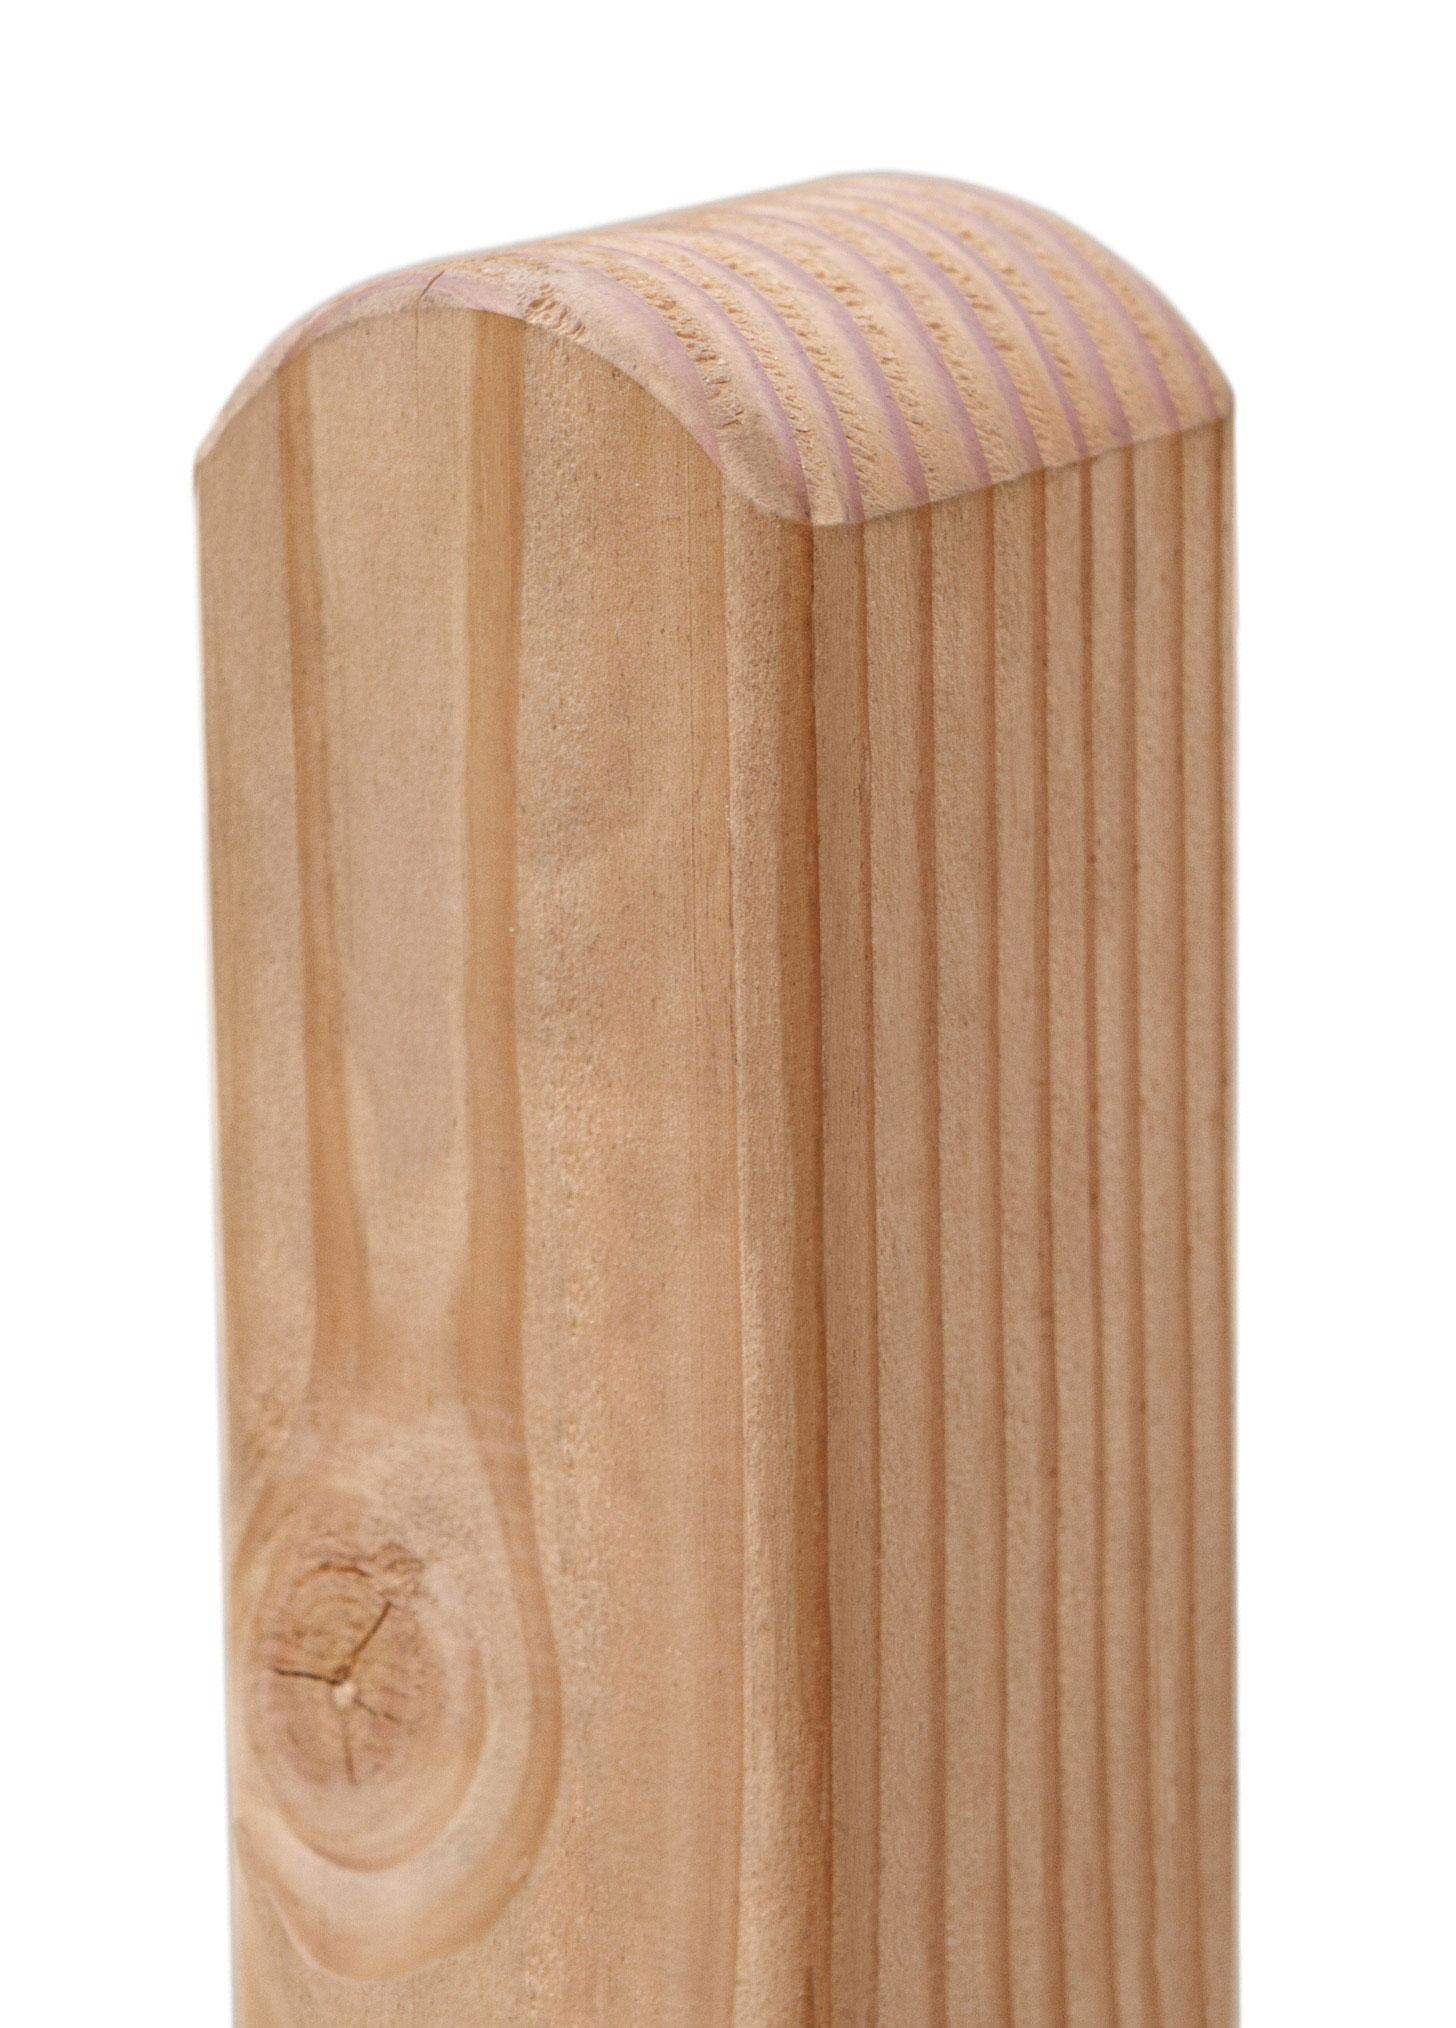 Zaunpfosten / Holzpfosten Rundkopf Lärche natur 9x9cm Länge 95cm Bild 1